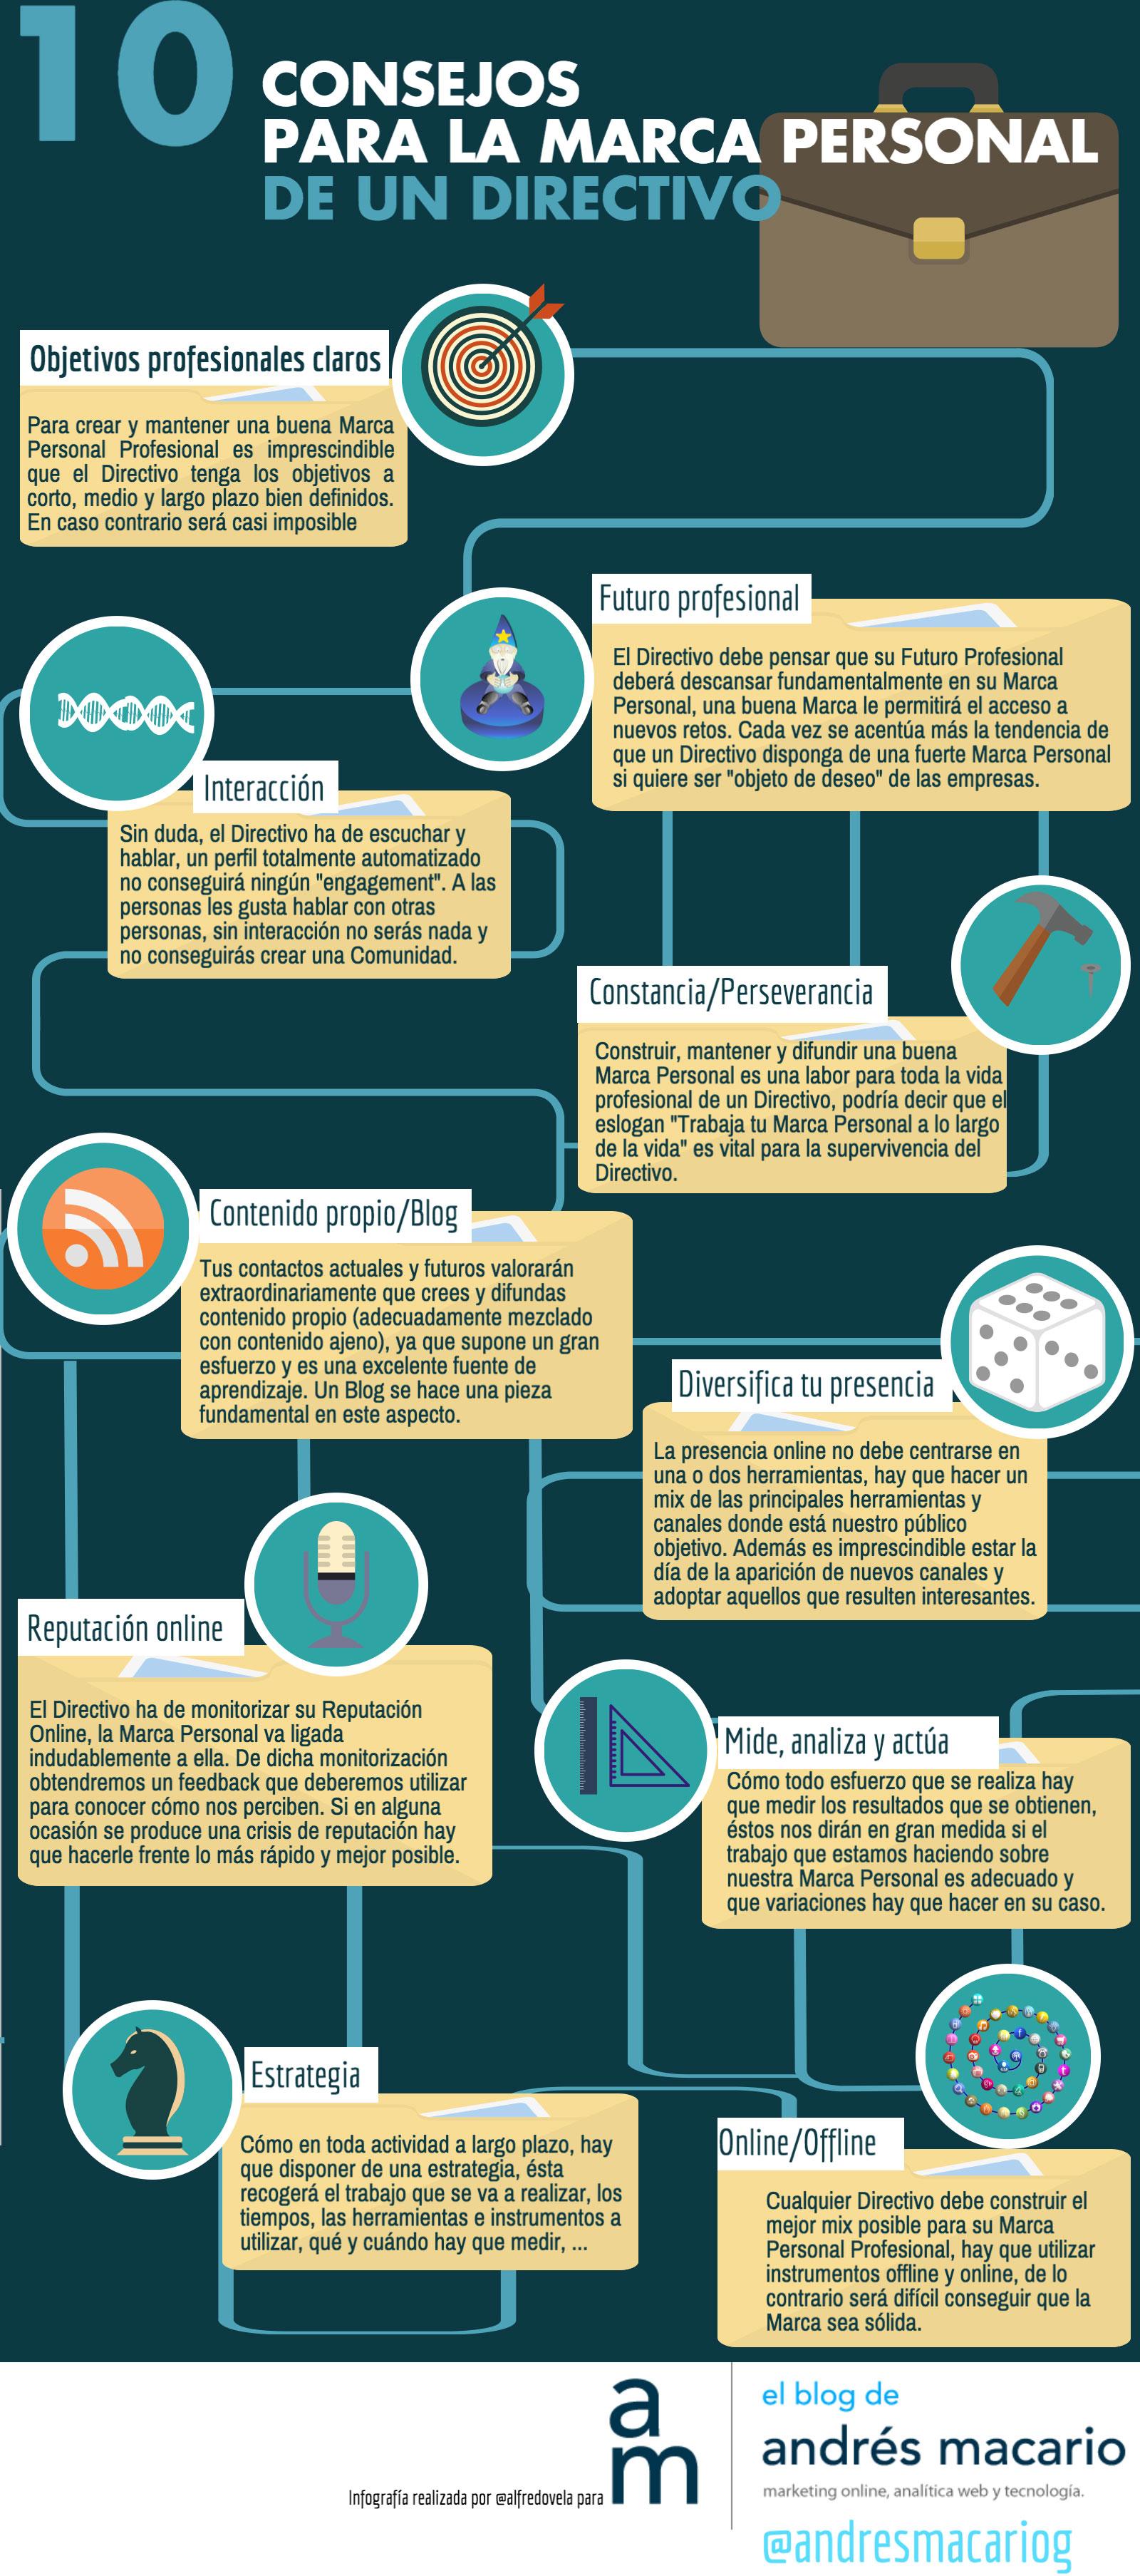 10-consejos-marca-personal-directivo-Andres-Macario-Infografia-Alfredo Vela